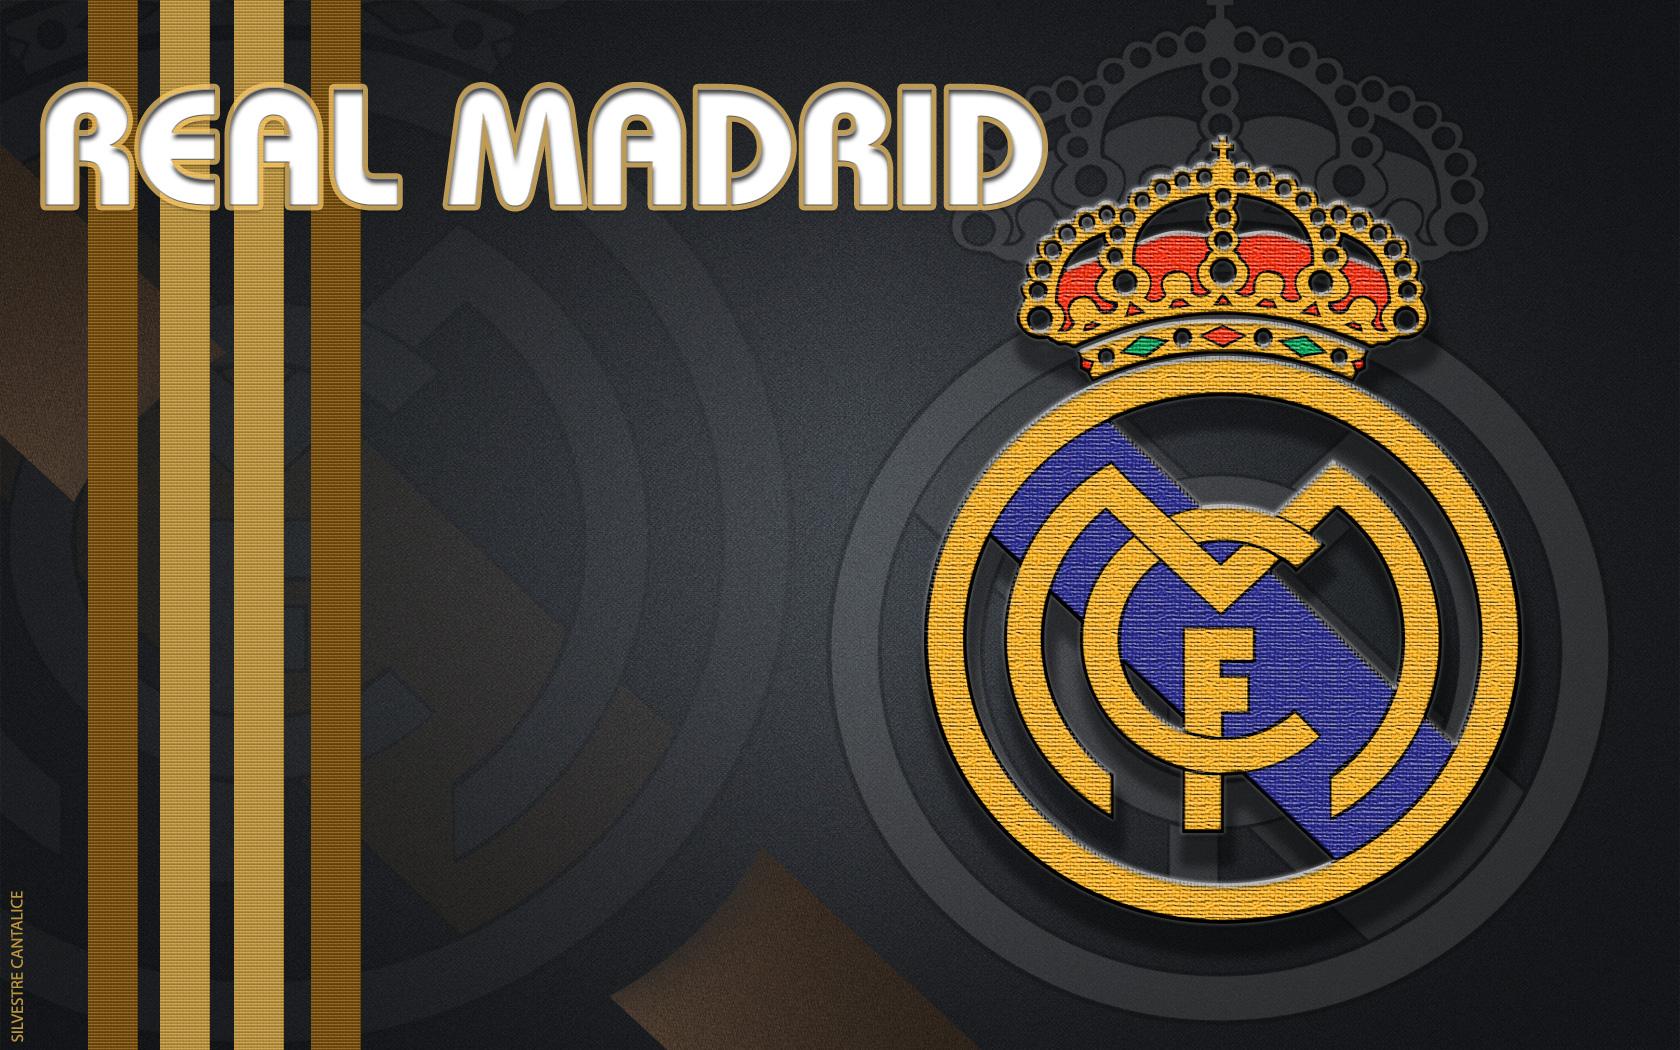 Star Wars Wallpaper Pc Hd Fondos De Pantalla Del Real Madrid Wallpapers Gratis